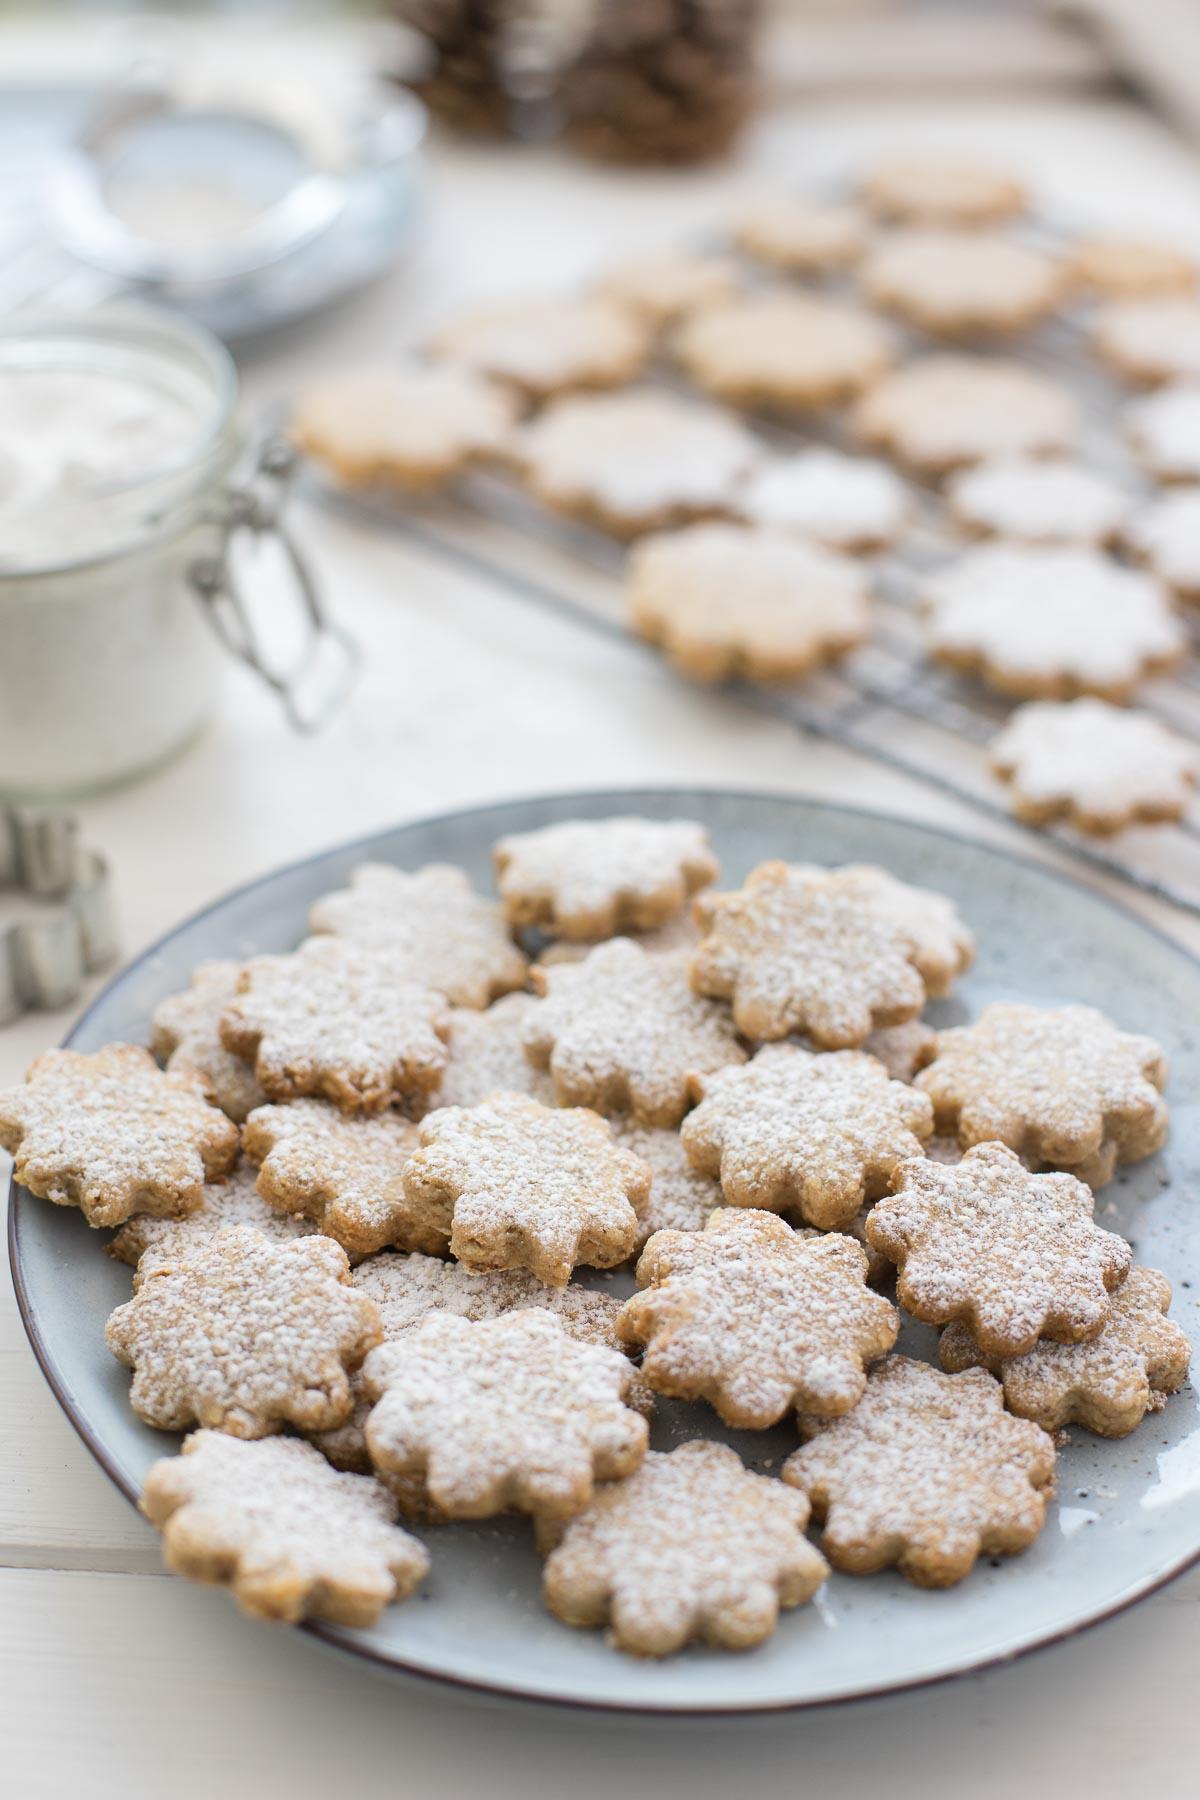 Lemon Almond Cookies with Spelt Flour